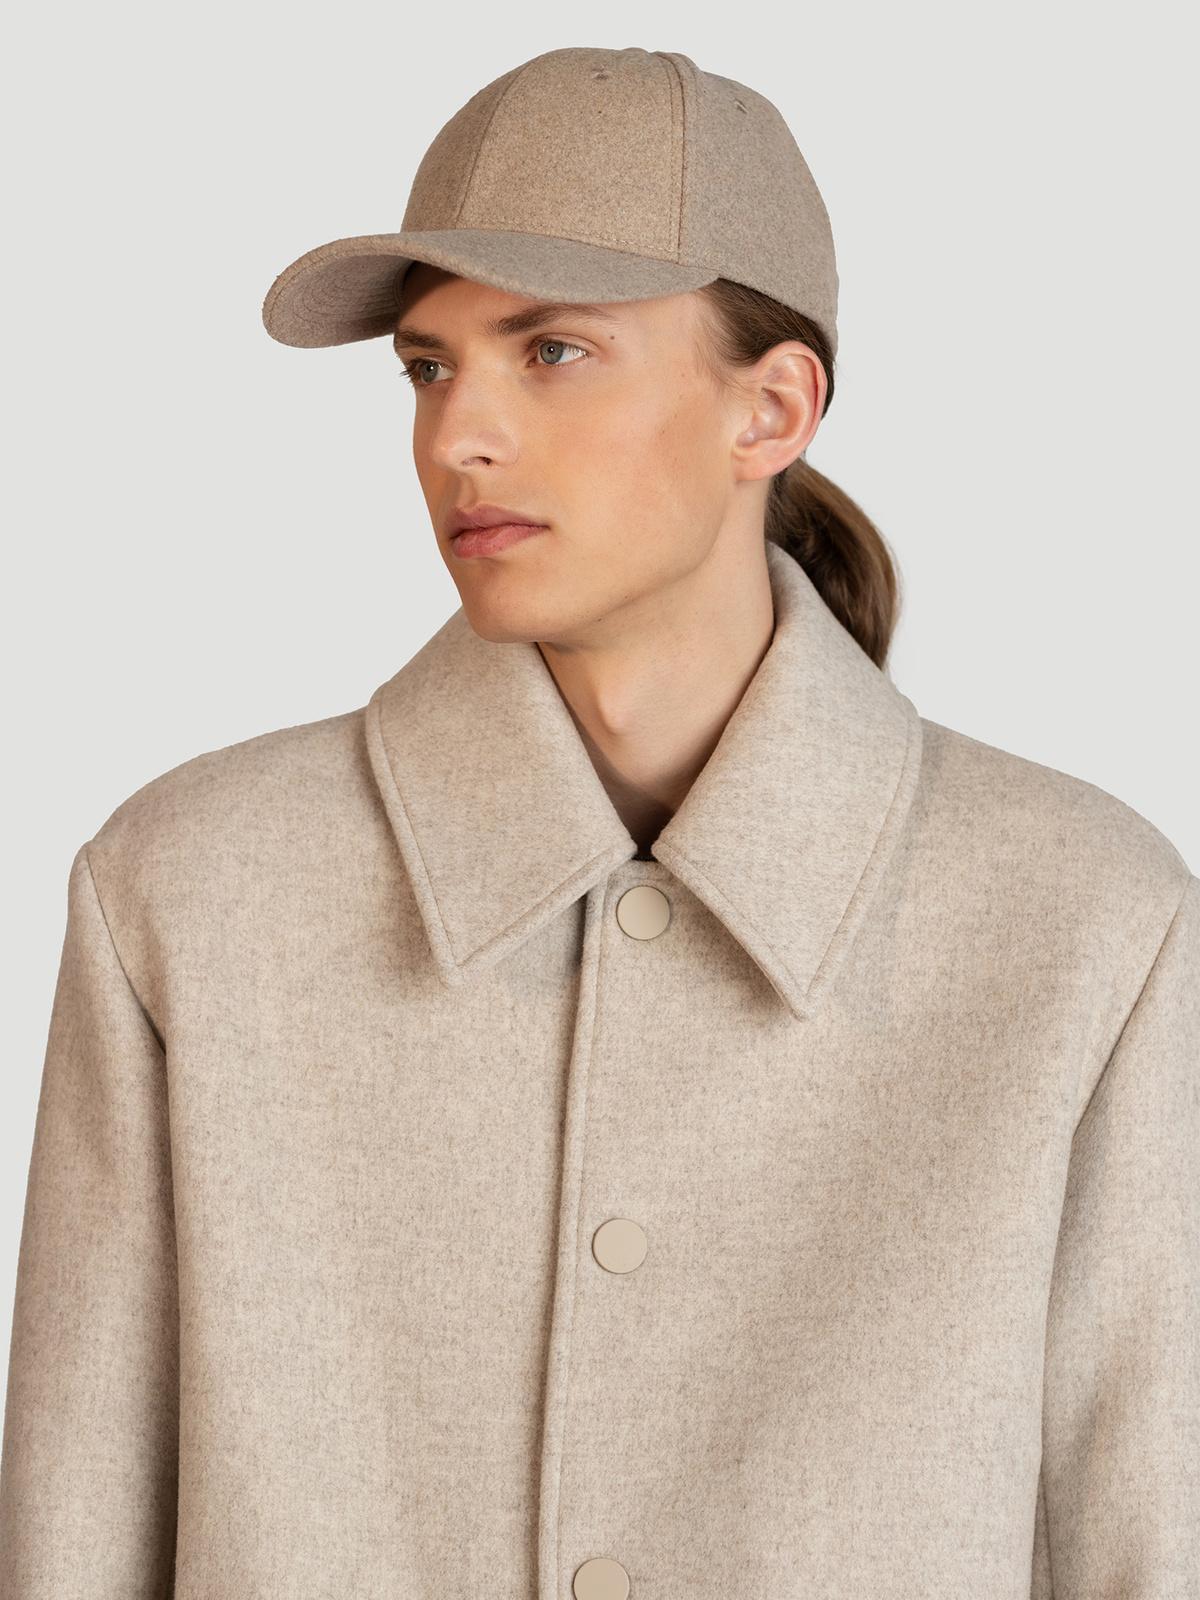 Holzweiler Wool Caps  Beige 1